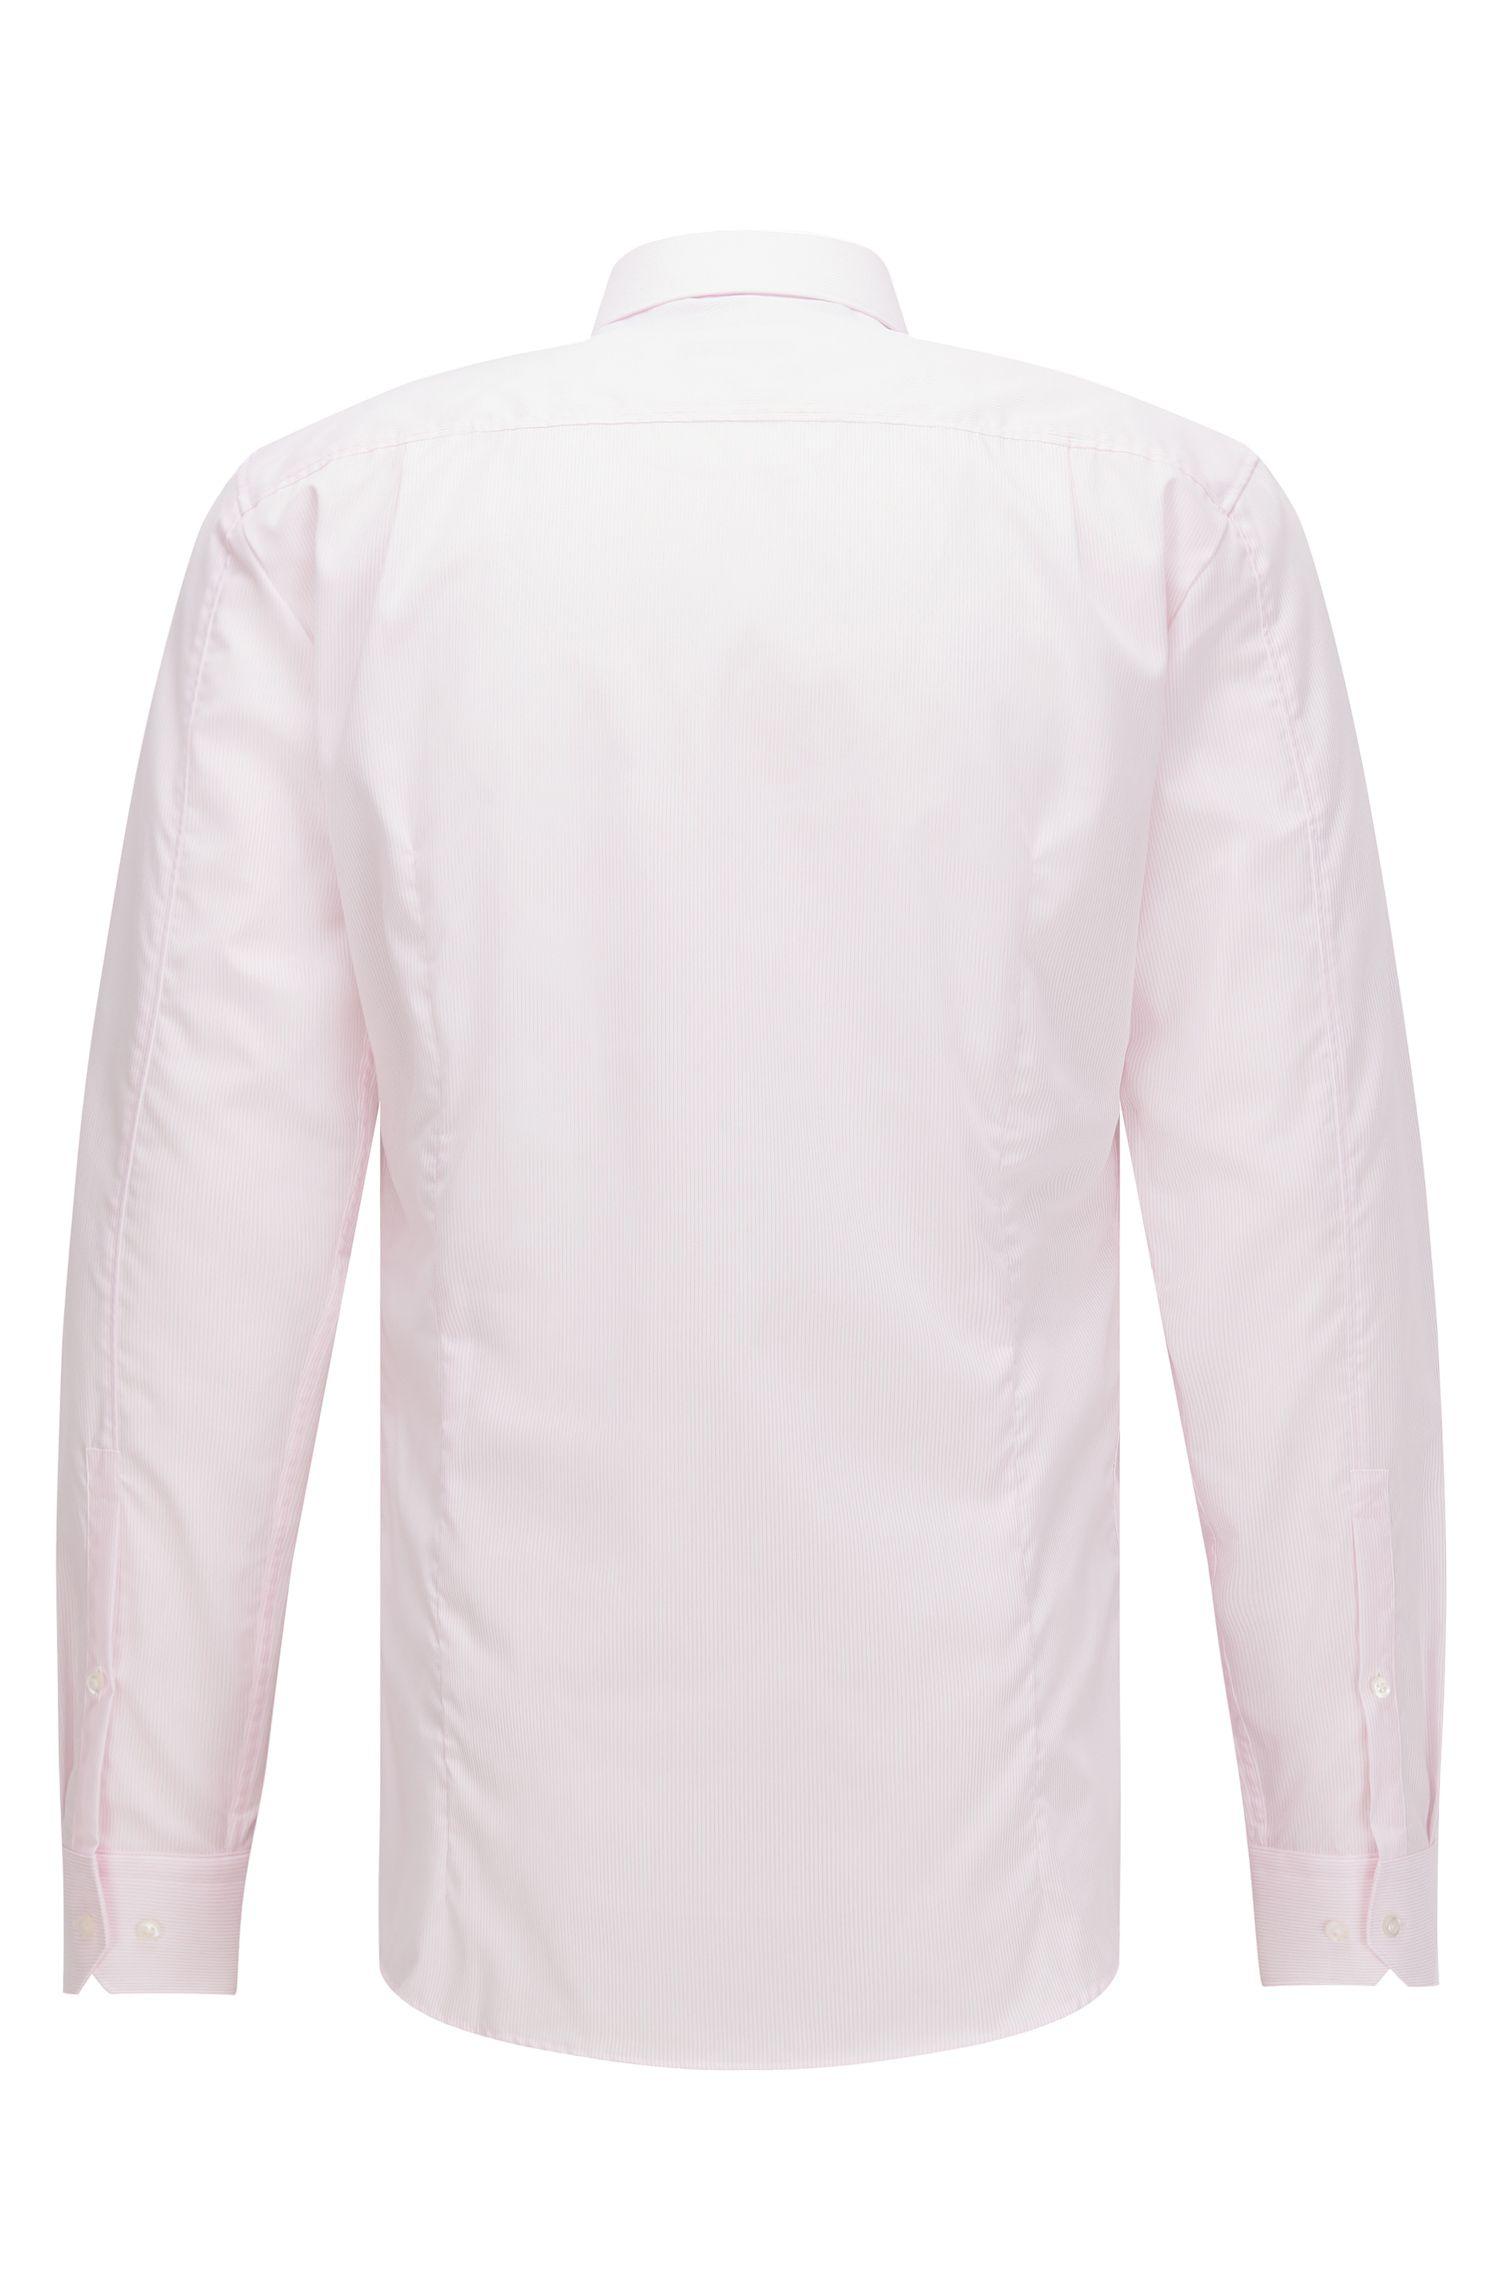 Striped Easy Iron Cotton Dress Shirt, Slim Fit   Elisha, light pink